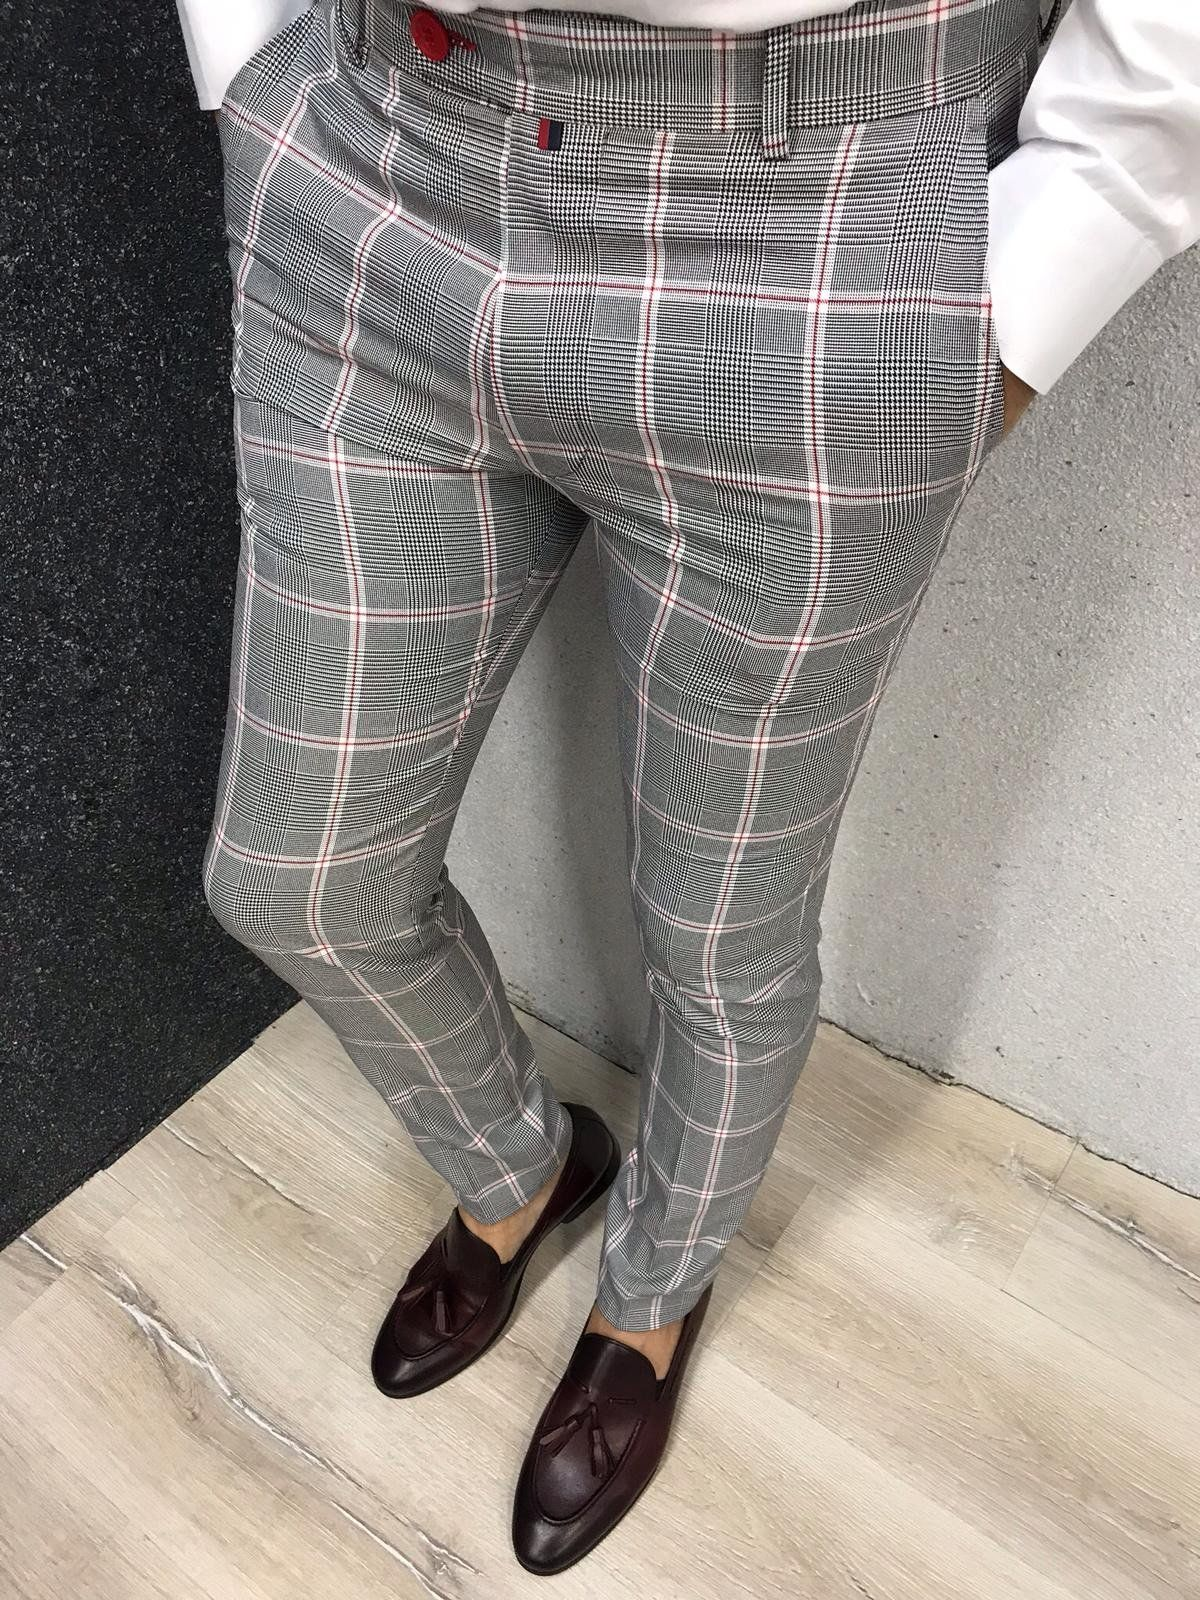 Kingston Gray Plaid Slim Pants Pants Outfit Men Mens Plaid Pants Mens Dress Pants [ 1600 x 1200 Pixel ]